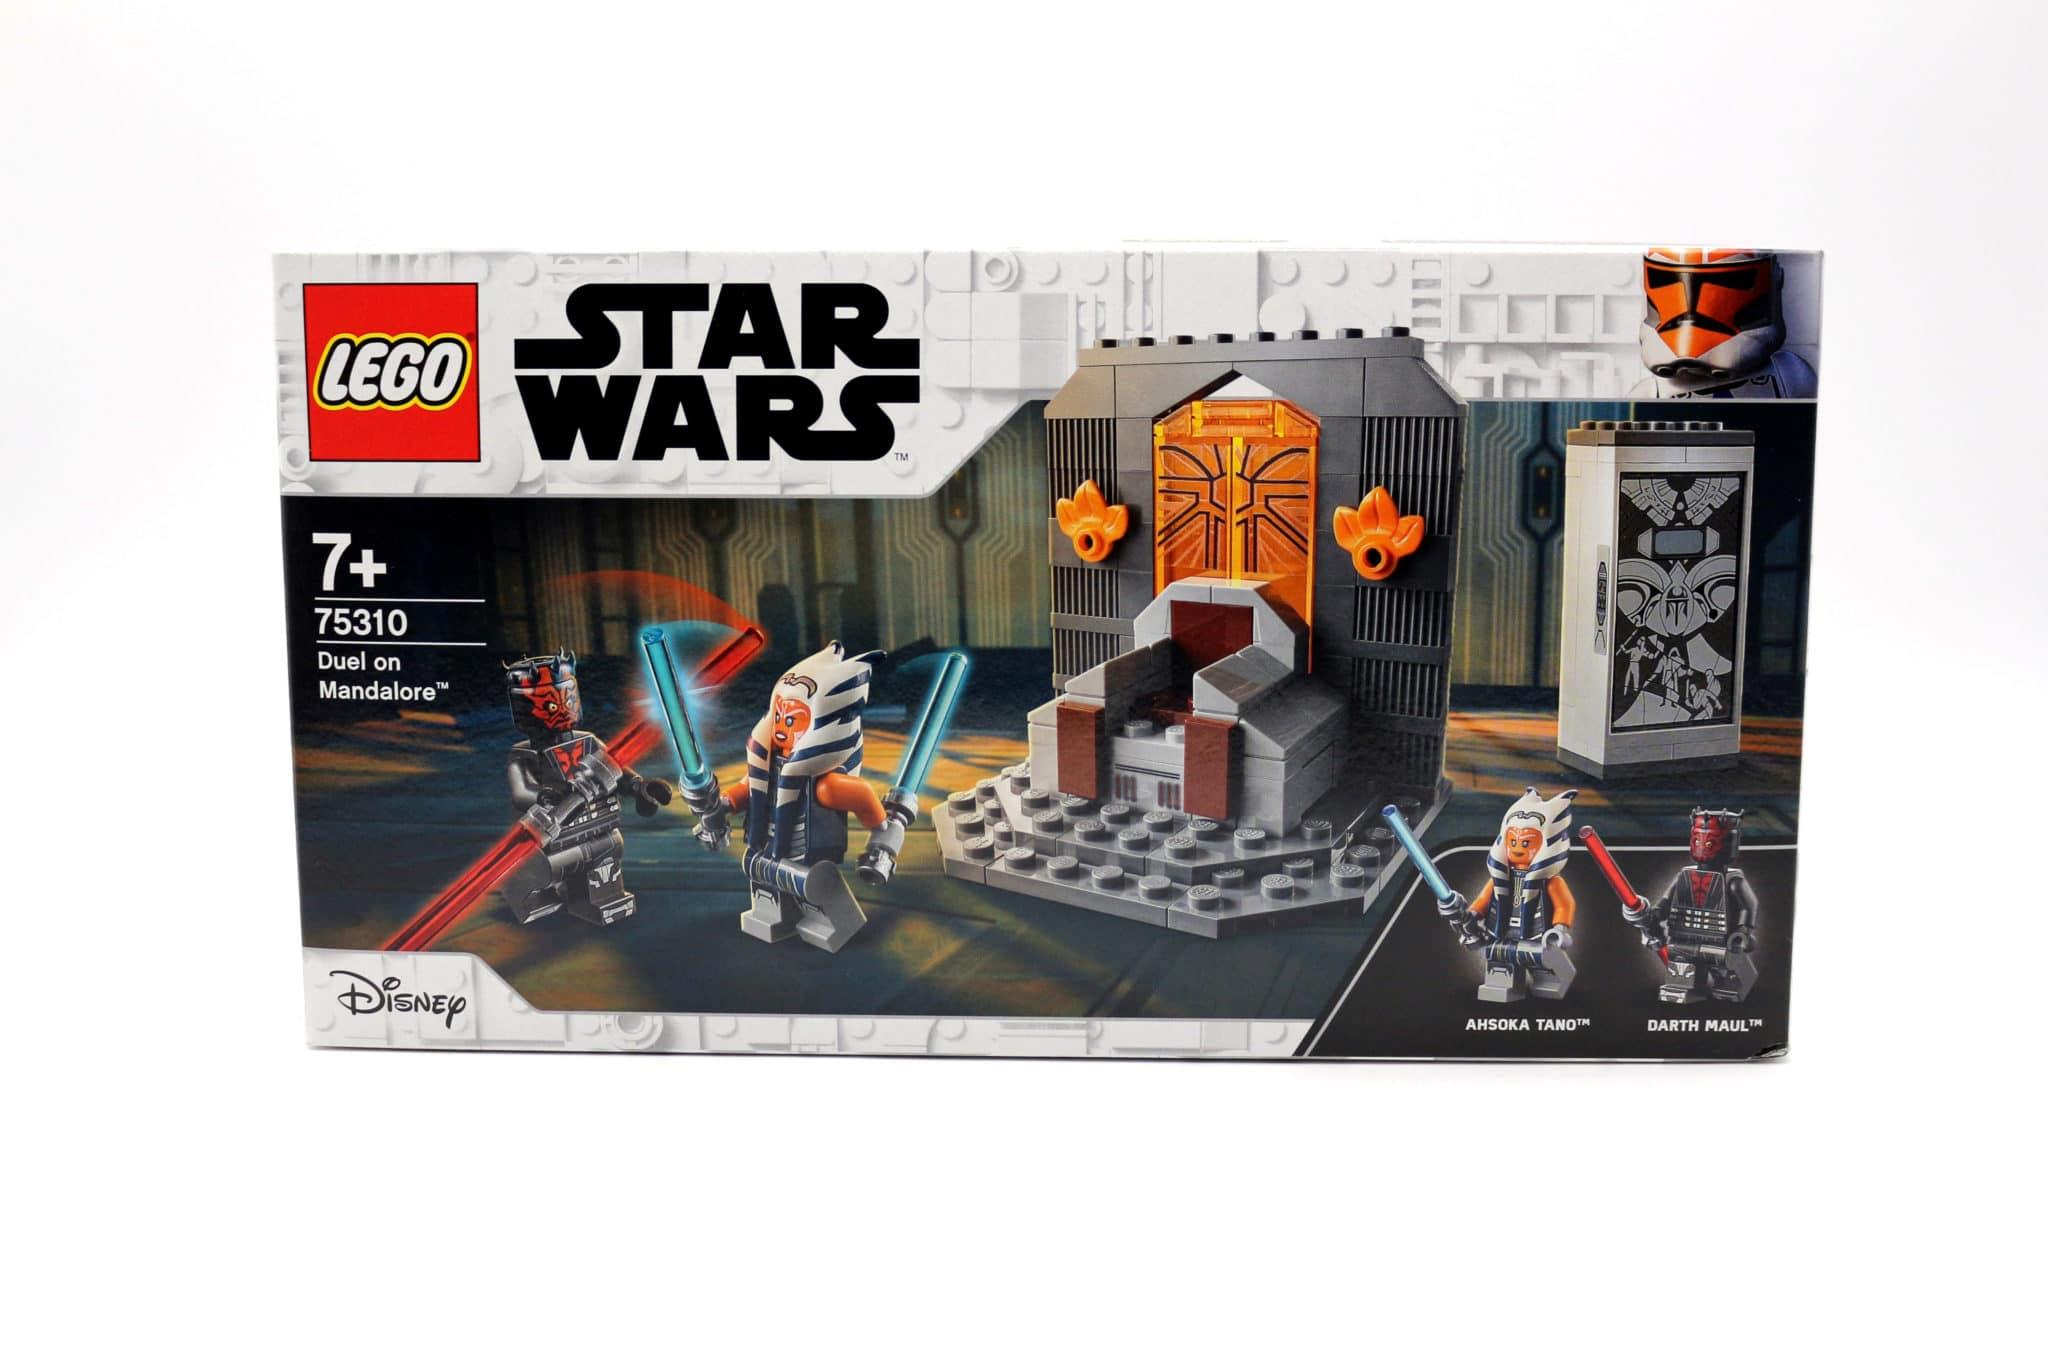 LEGO Star Wars 75310 Duel on Mandalore 1